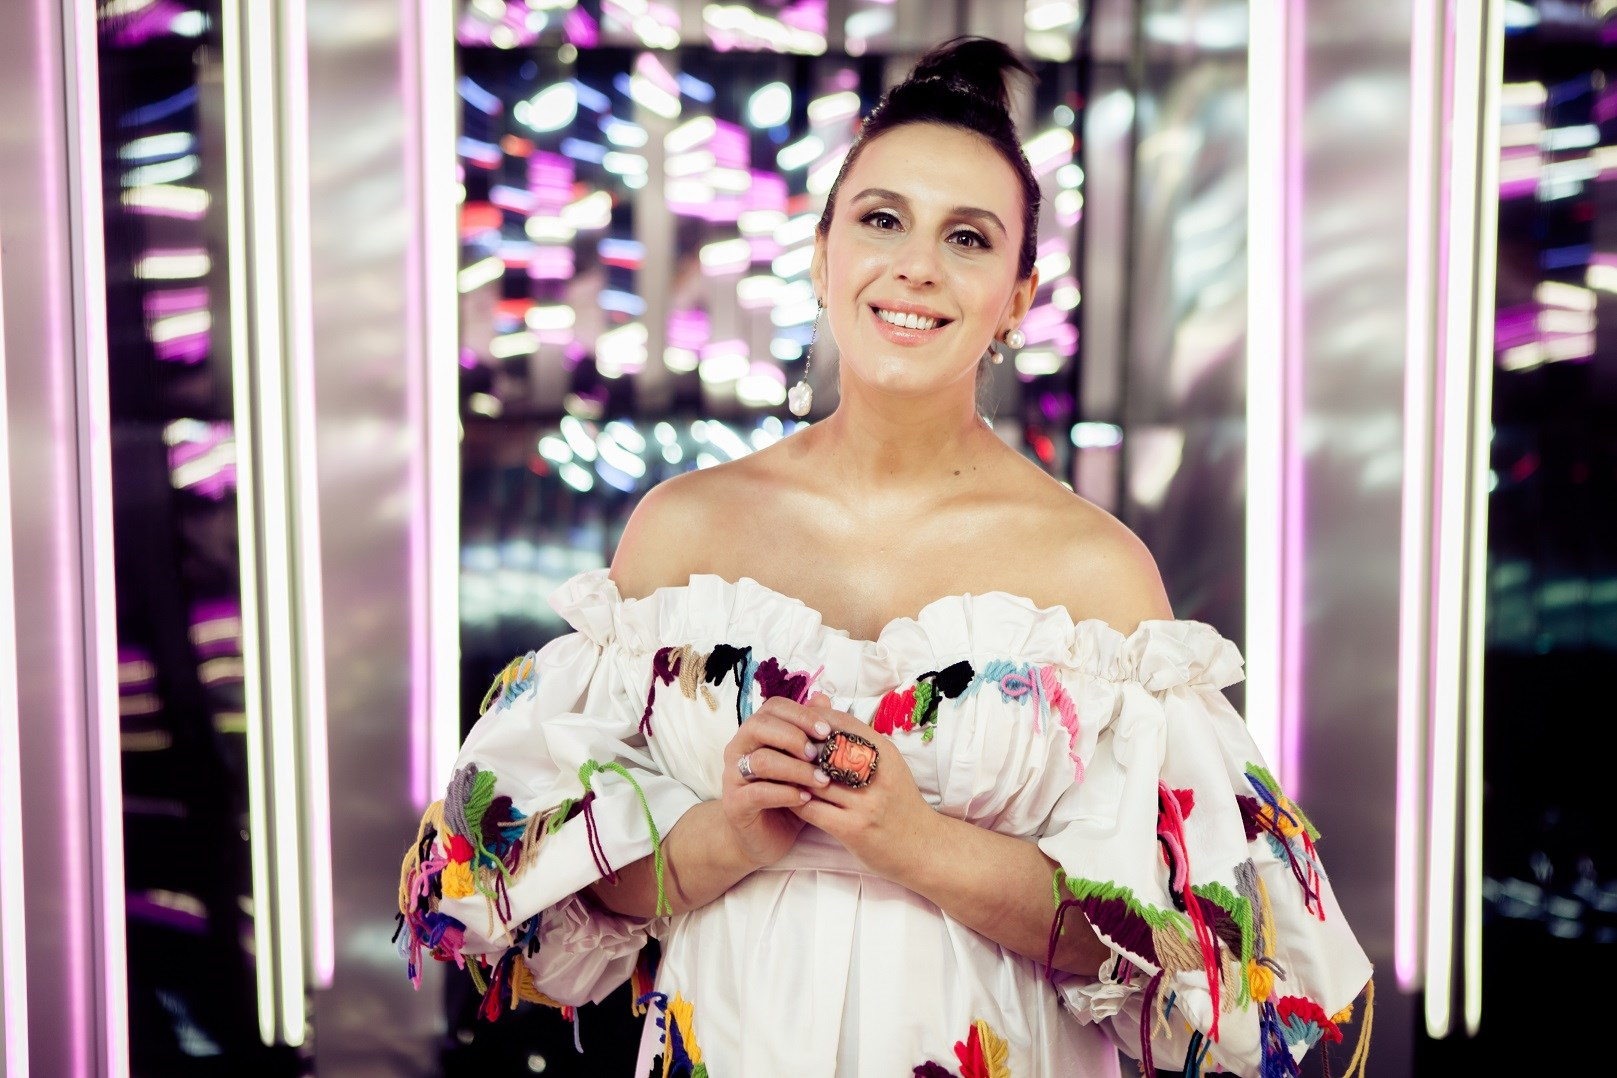 Джамала народила первістка: співачка розкрила ім'я малюка